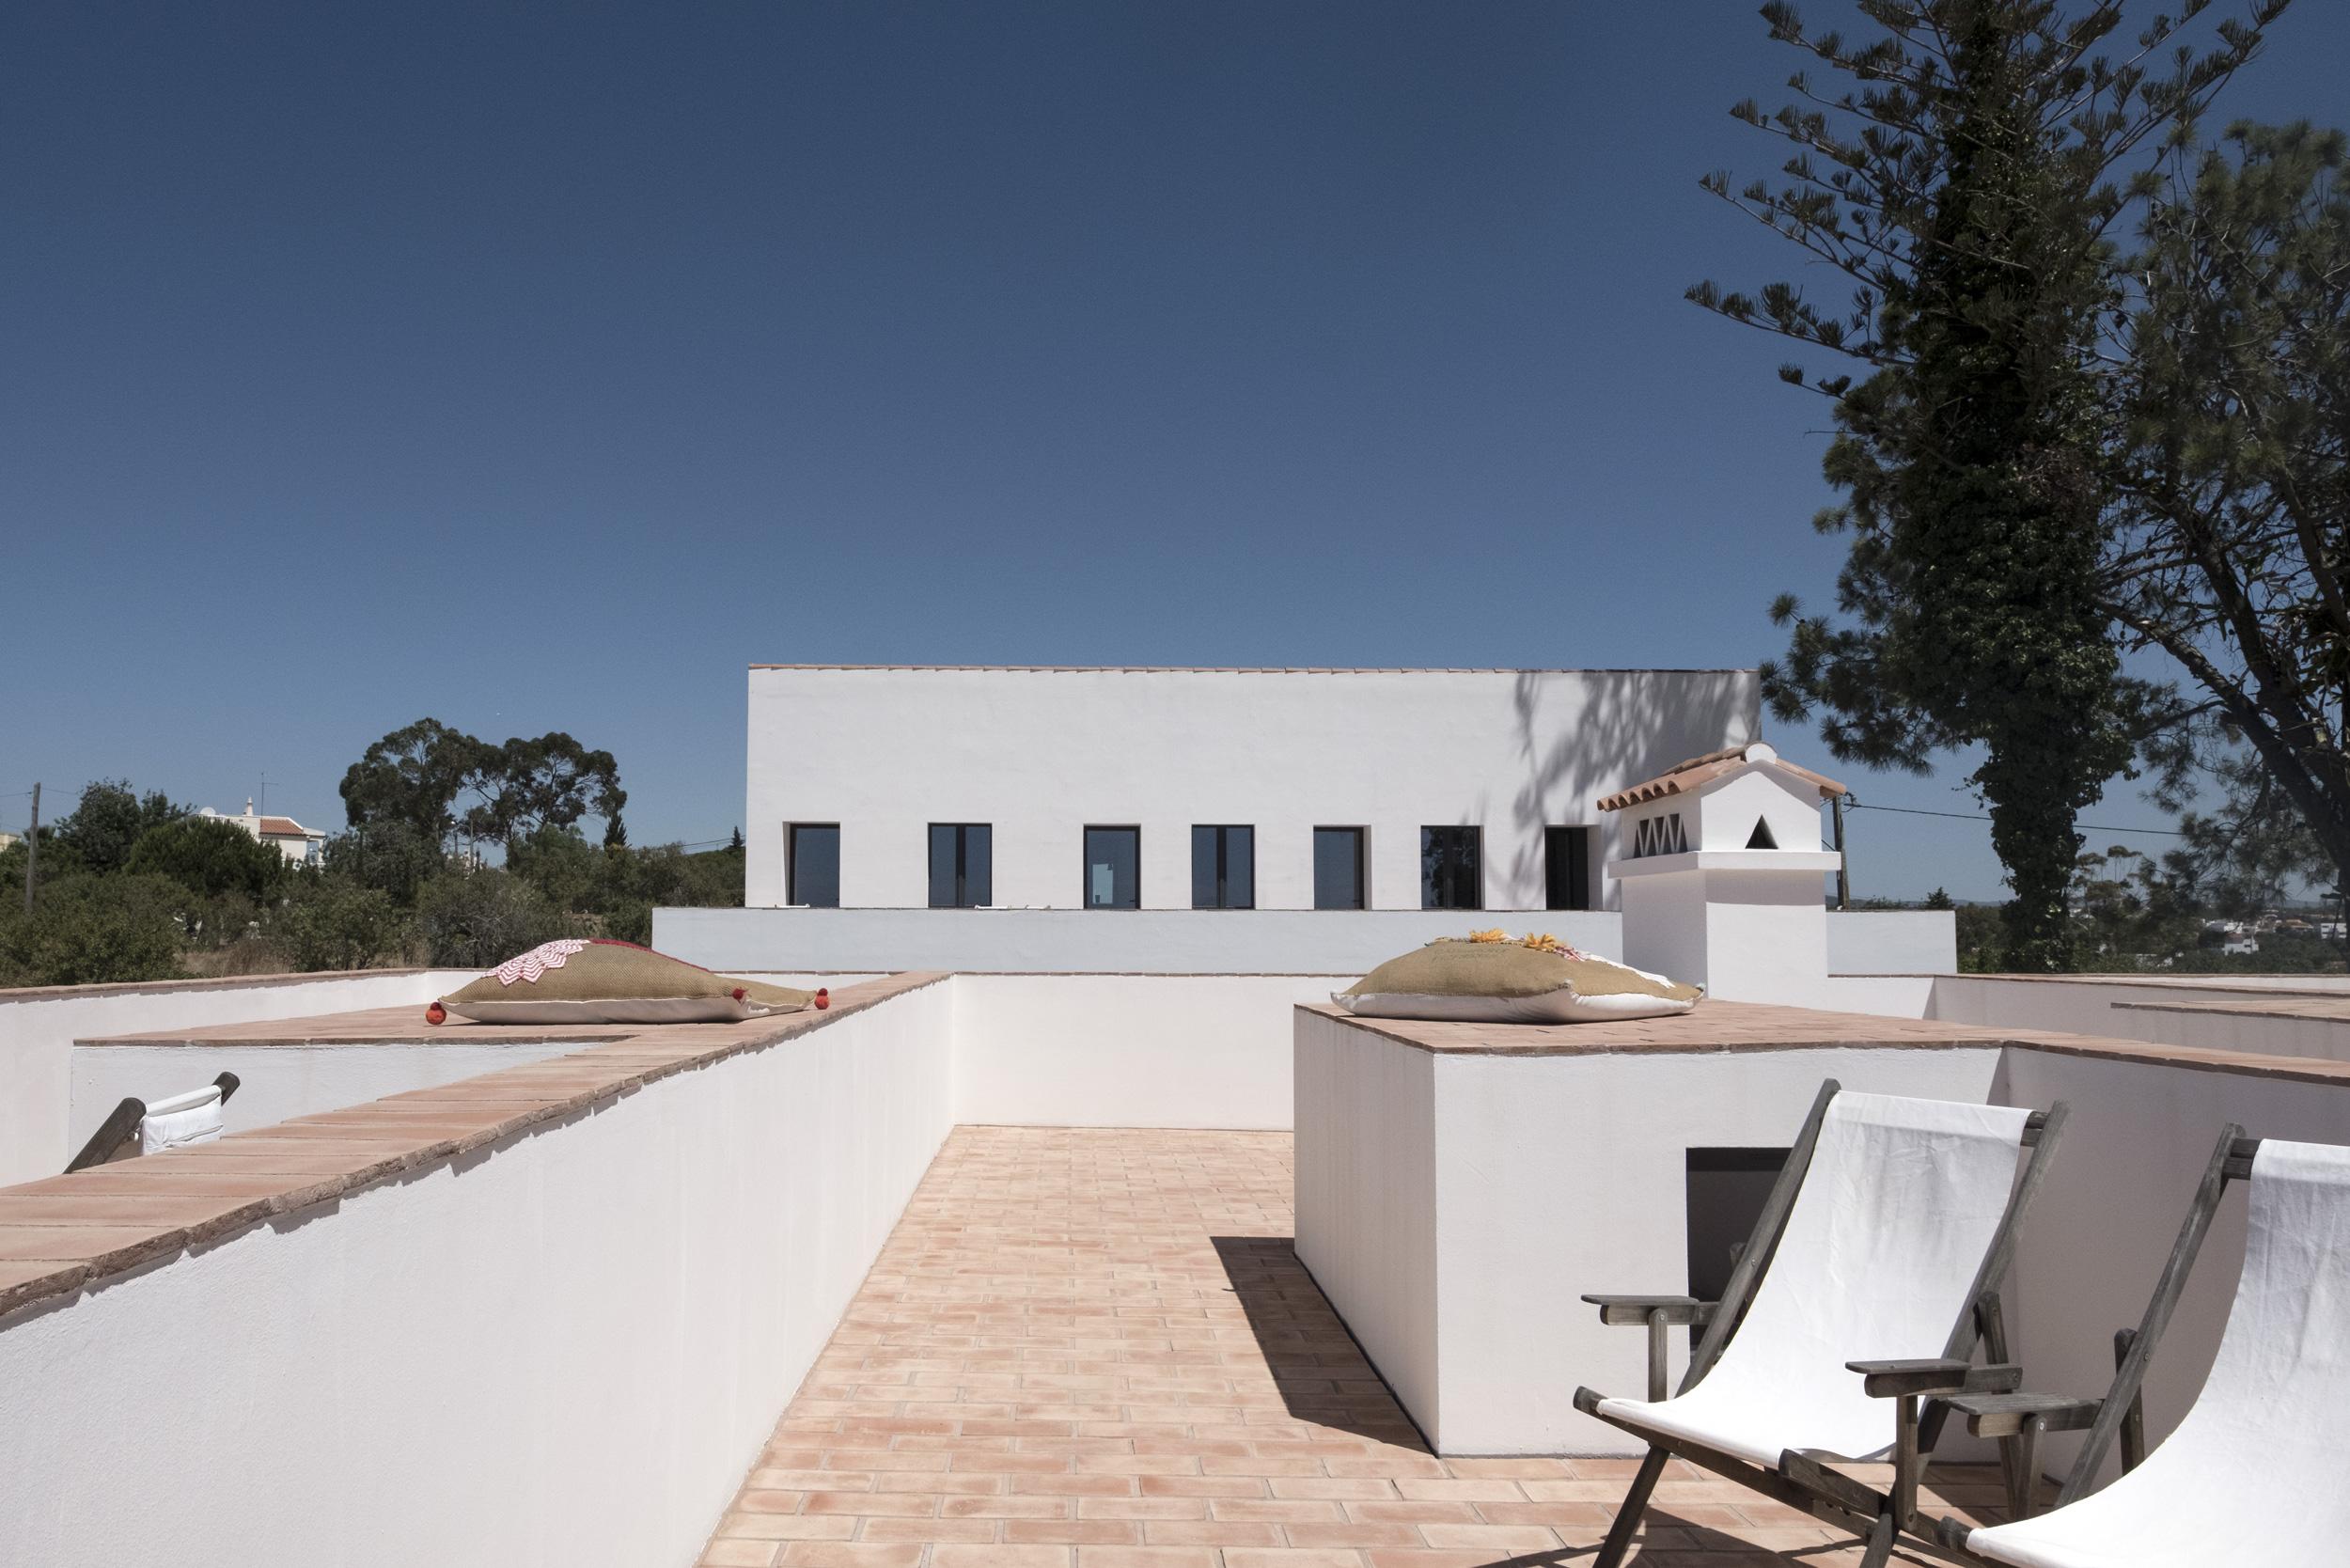 Casa-Modesta-exterior-Fiona-Burrage.jpg